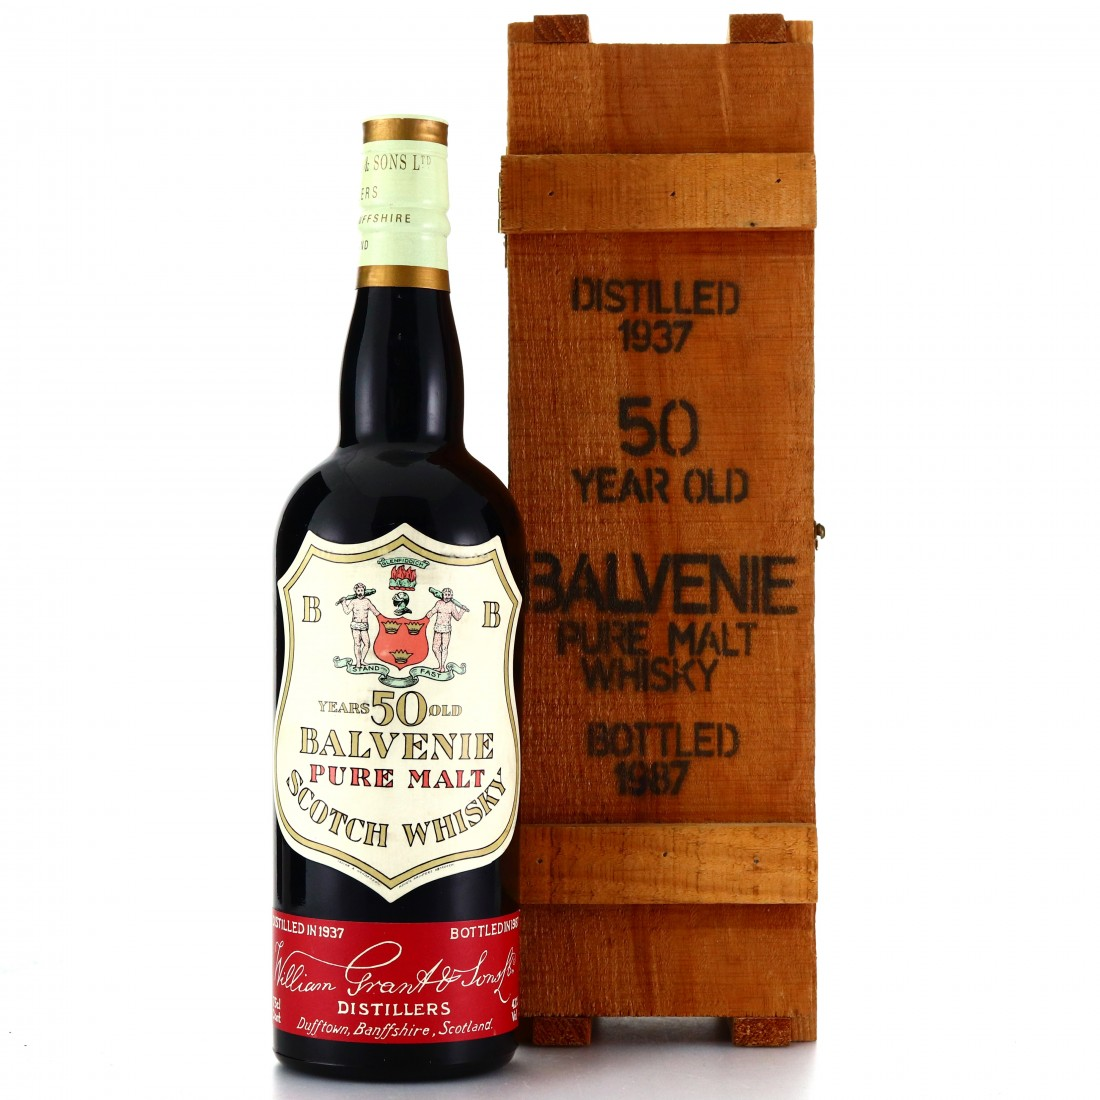 Balvenie 1937 Pure Malt 50 Year Old 75cl / Milroy's of Soho